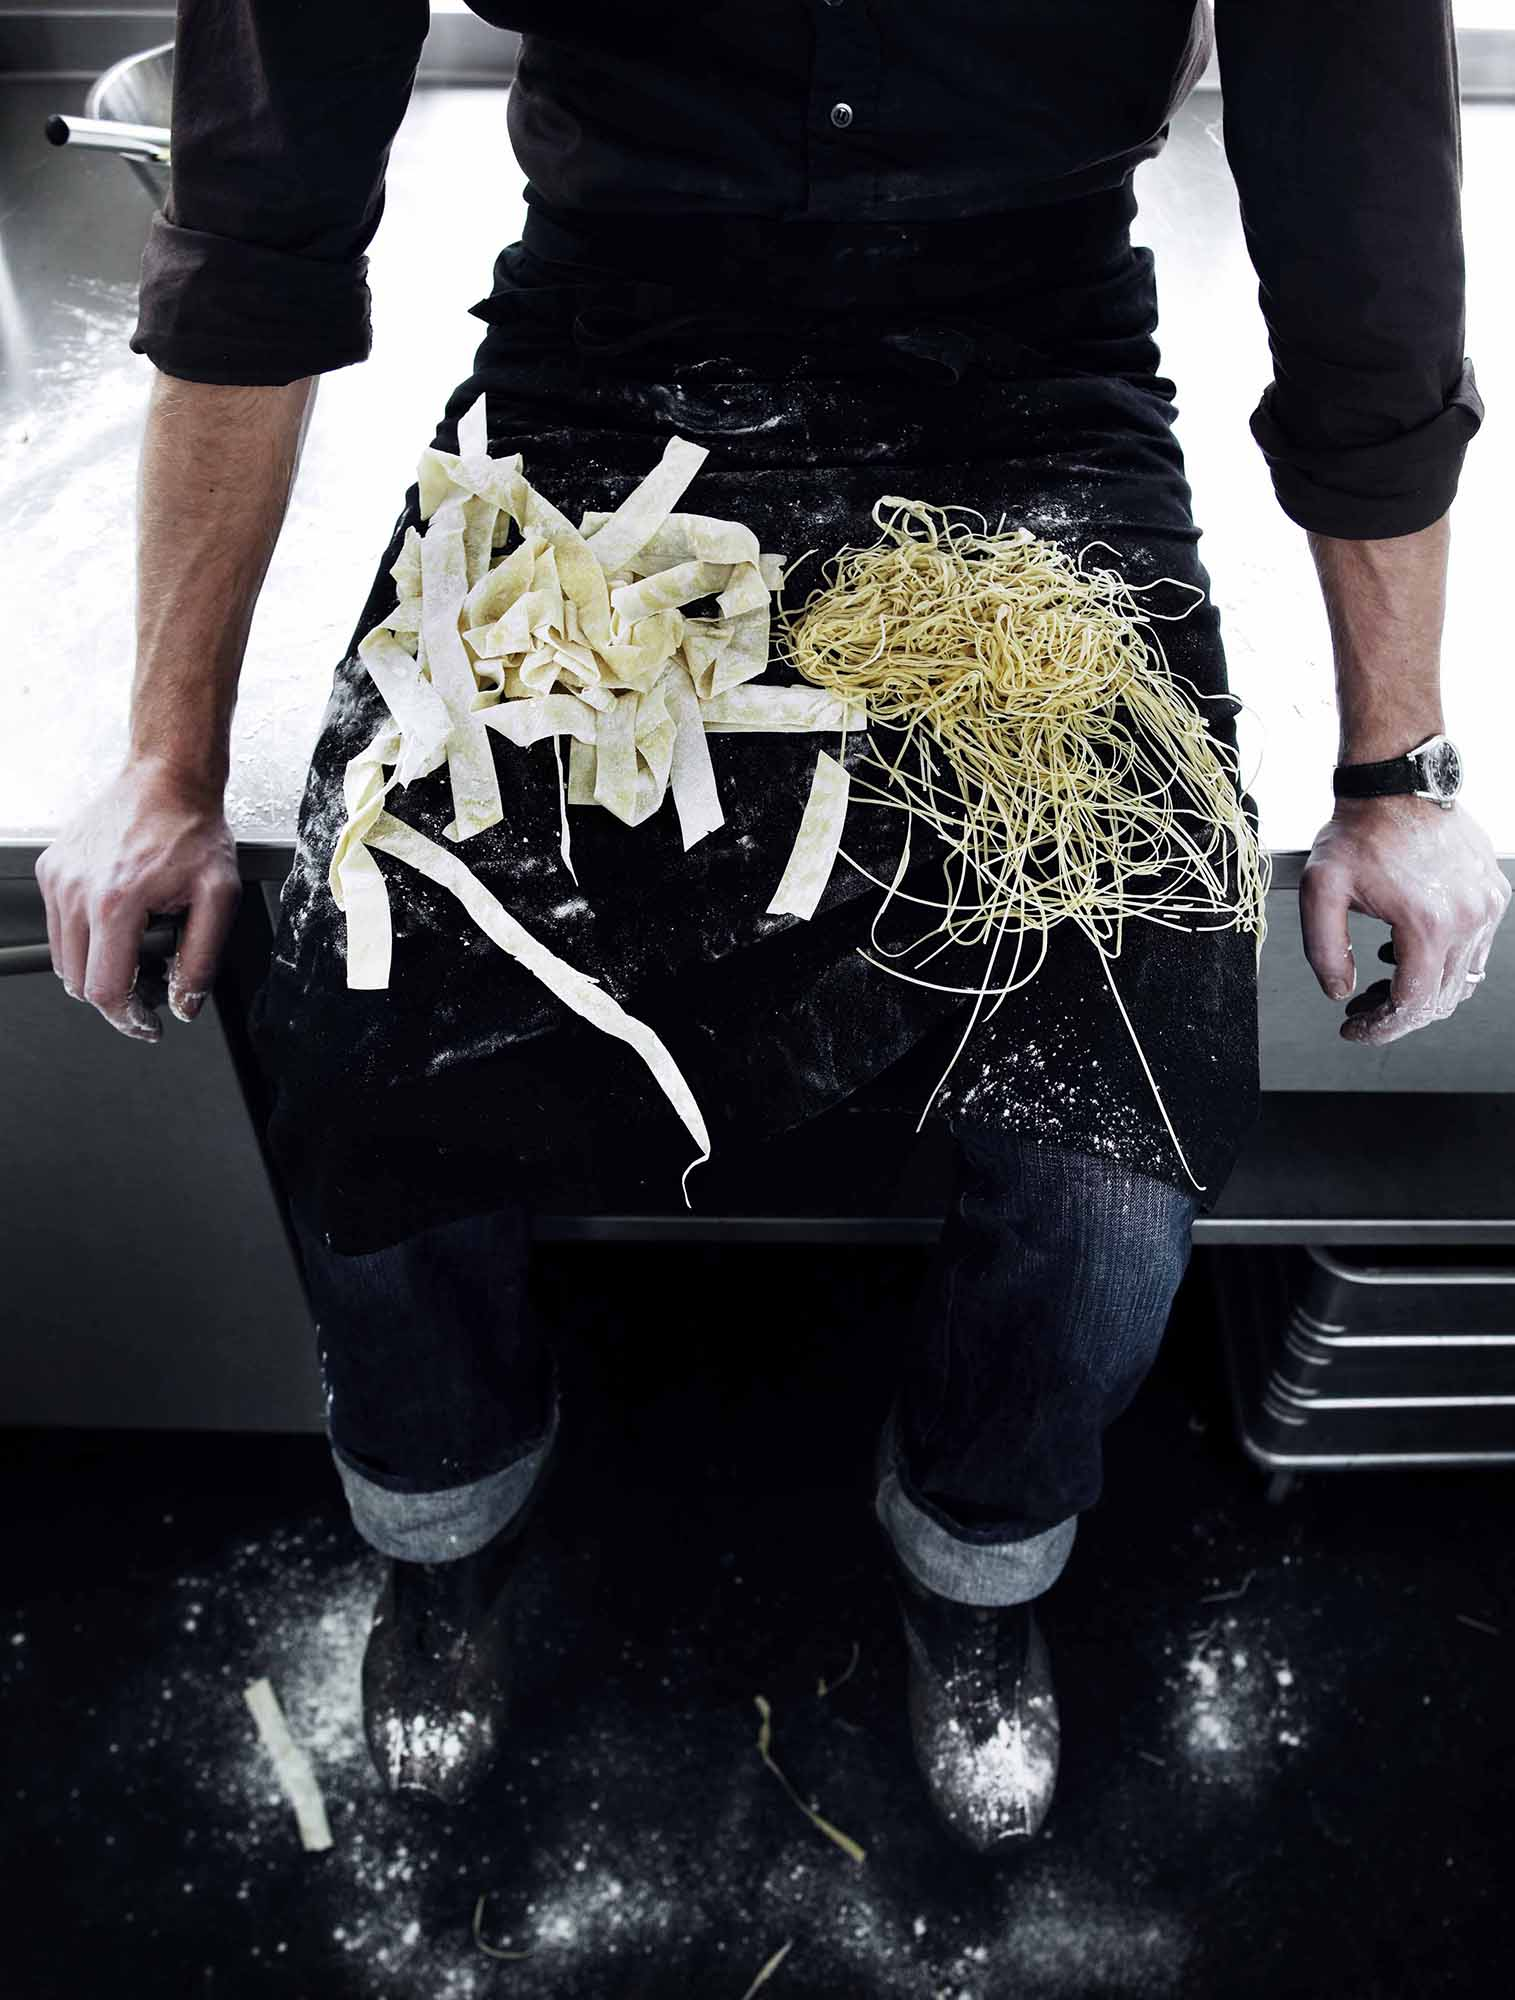 Lars Ranek - chef with pasta